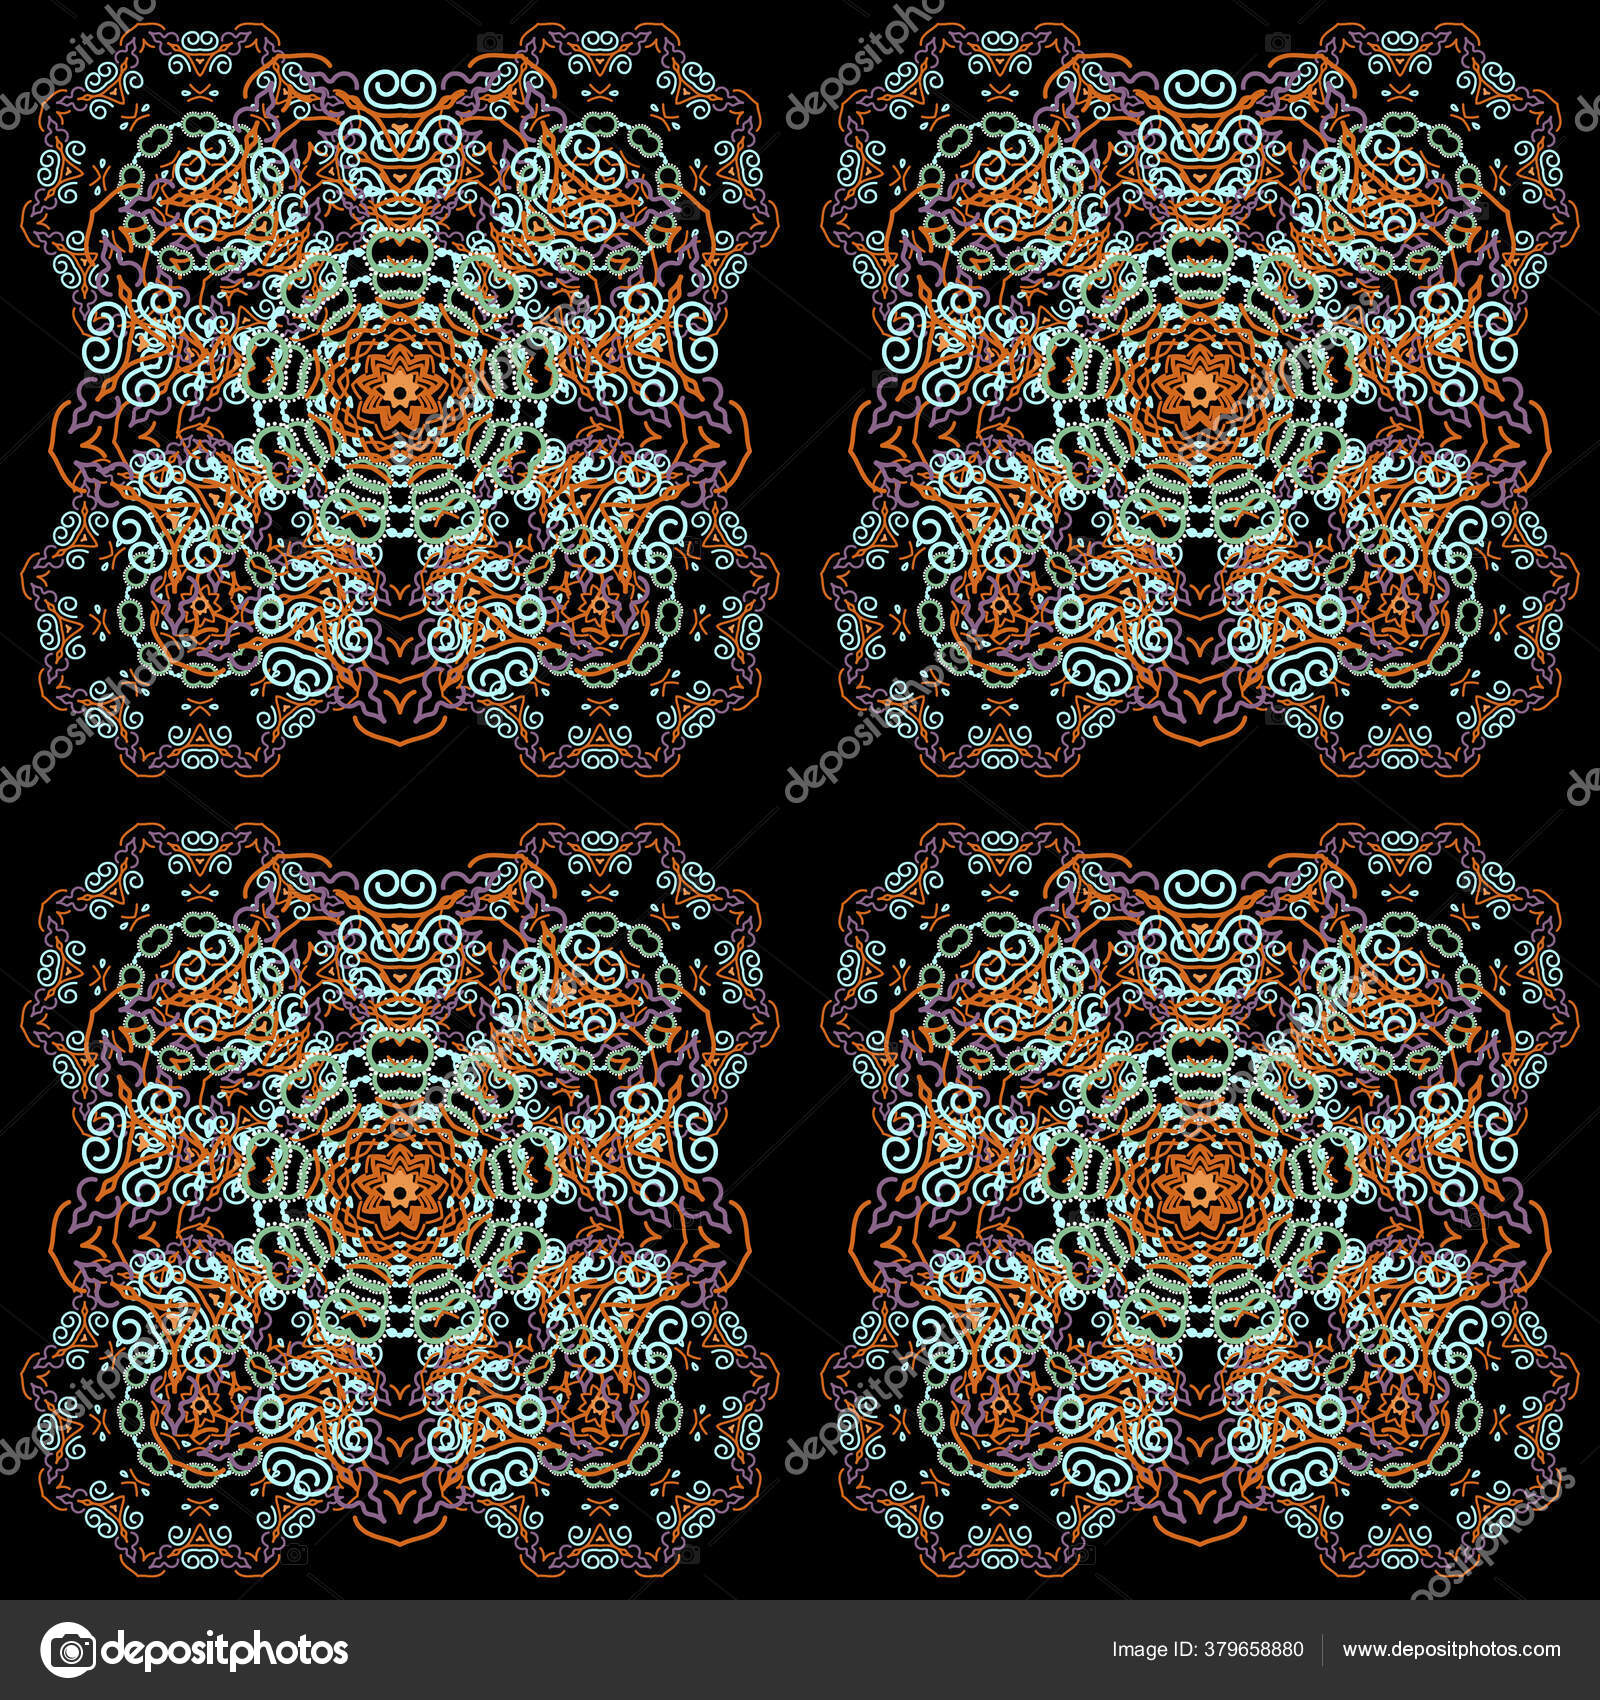 retro digital paper vektor ornamen geometris latar belakang dekoratif untuk stok vektor c design at ua gmail com 379658880 depositphotos